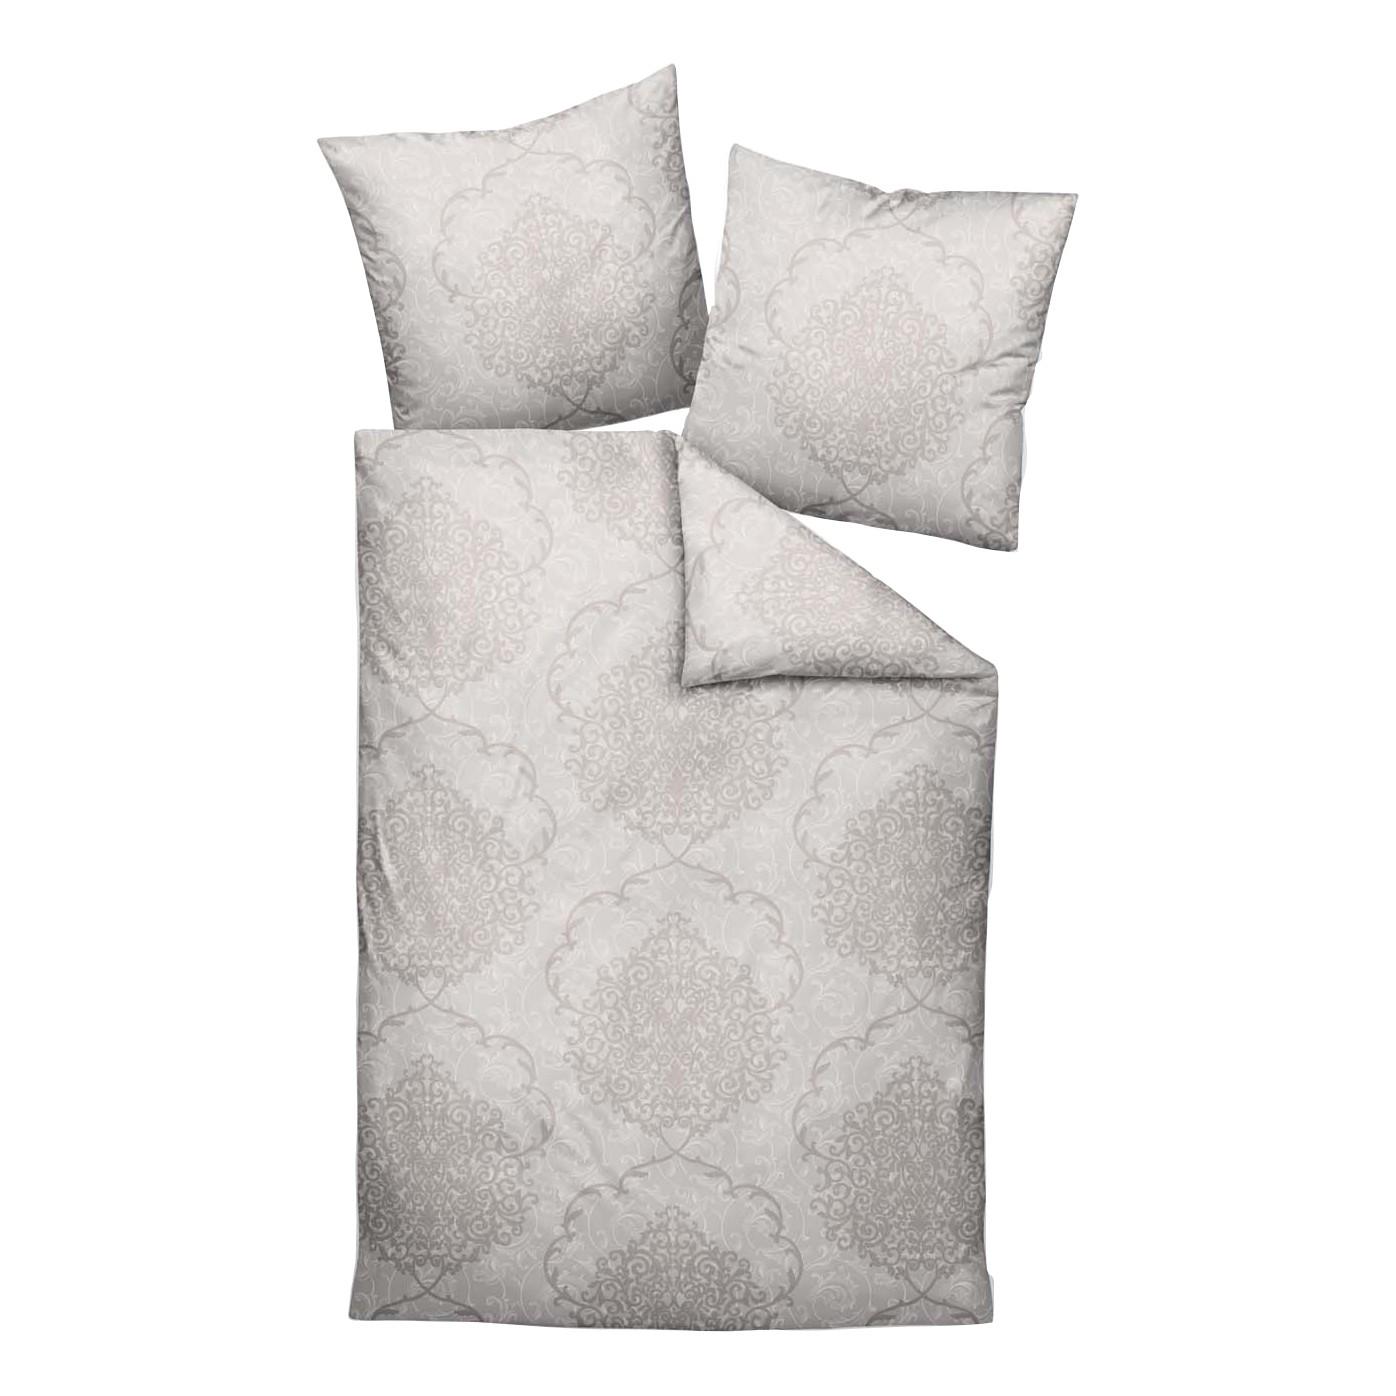 shopthewall mako satin bettwsche elgin baumwollstoff. Black Bedroom Furniture Sets. Home Design Ideas